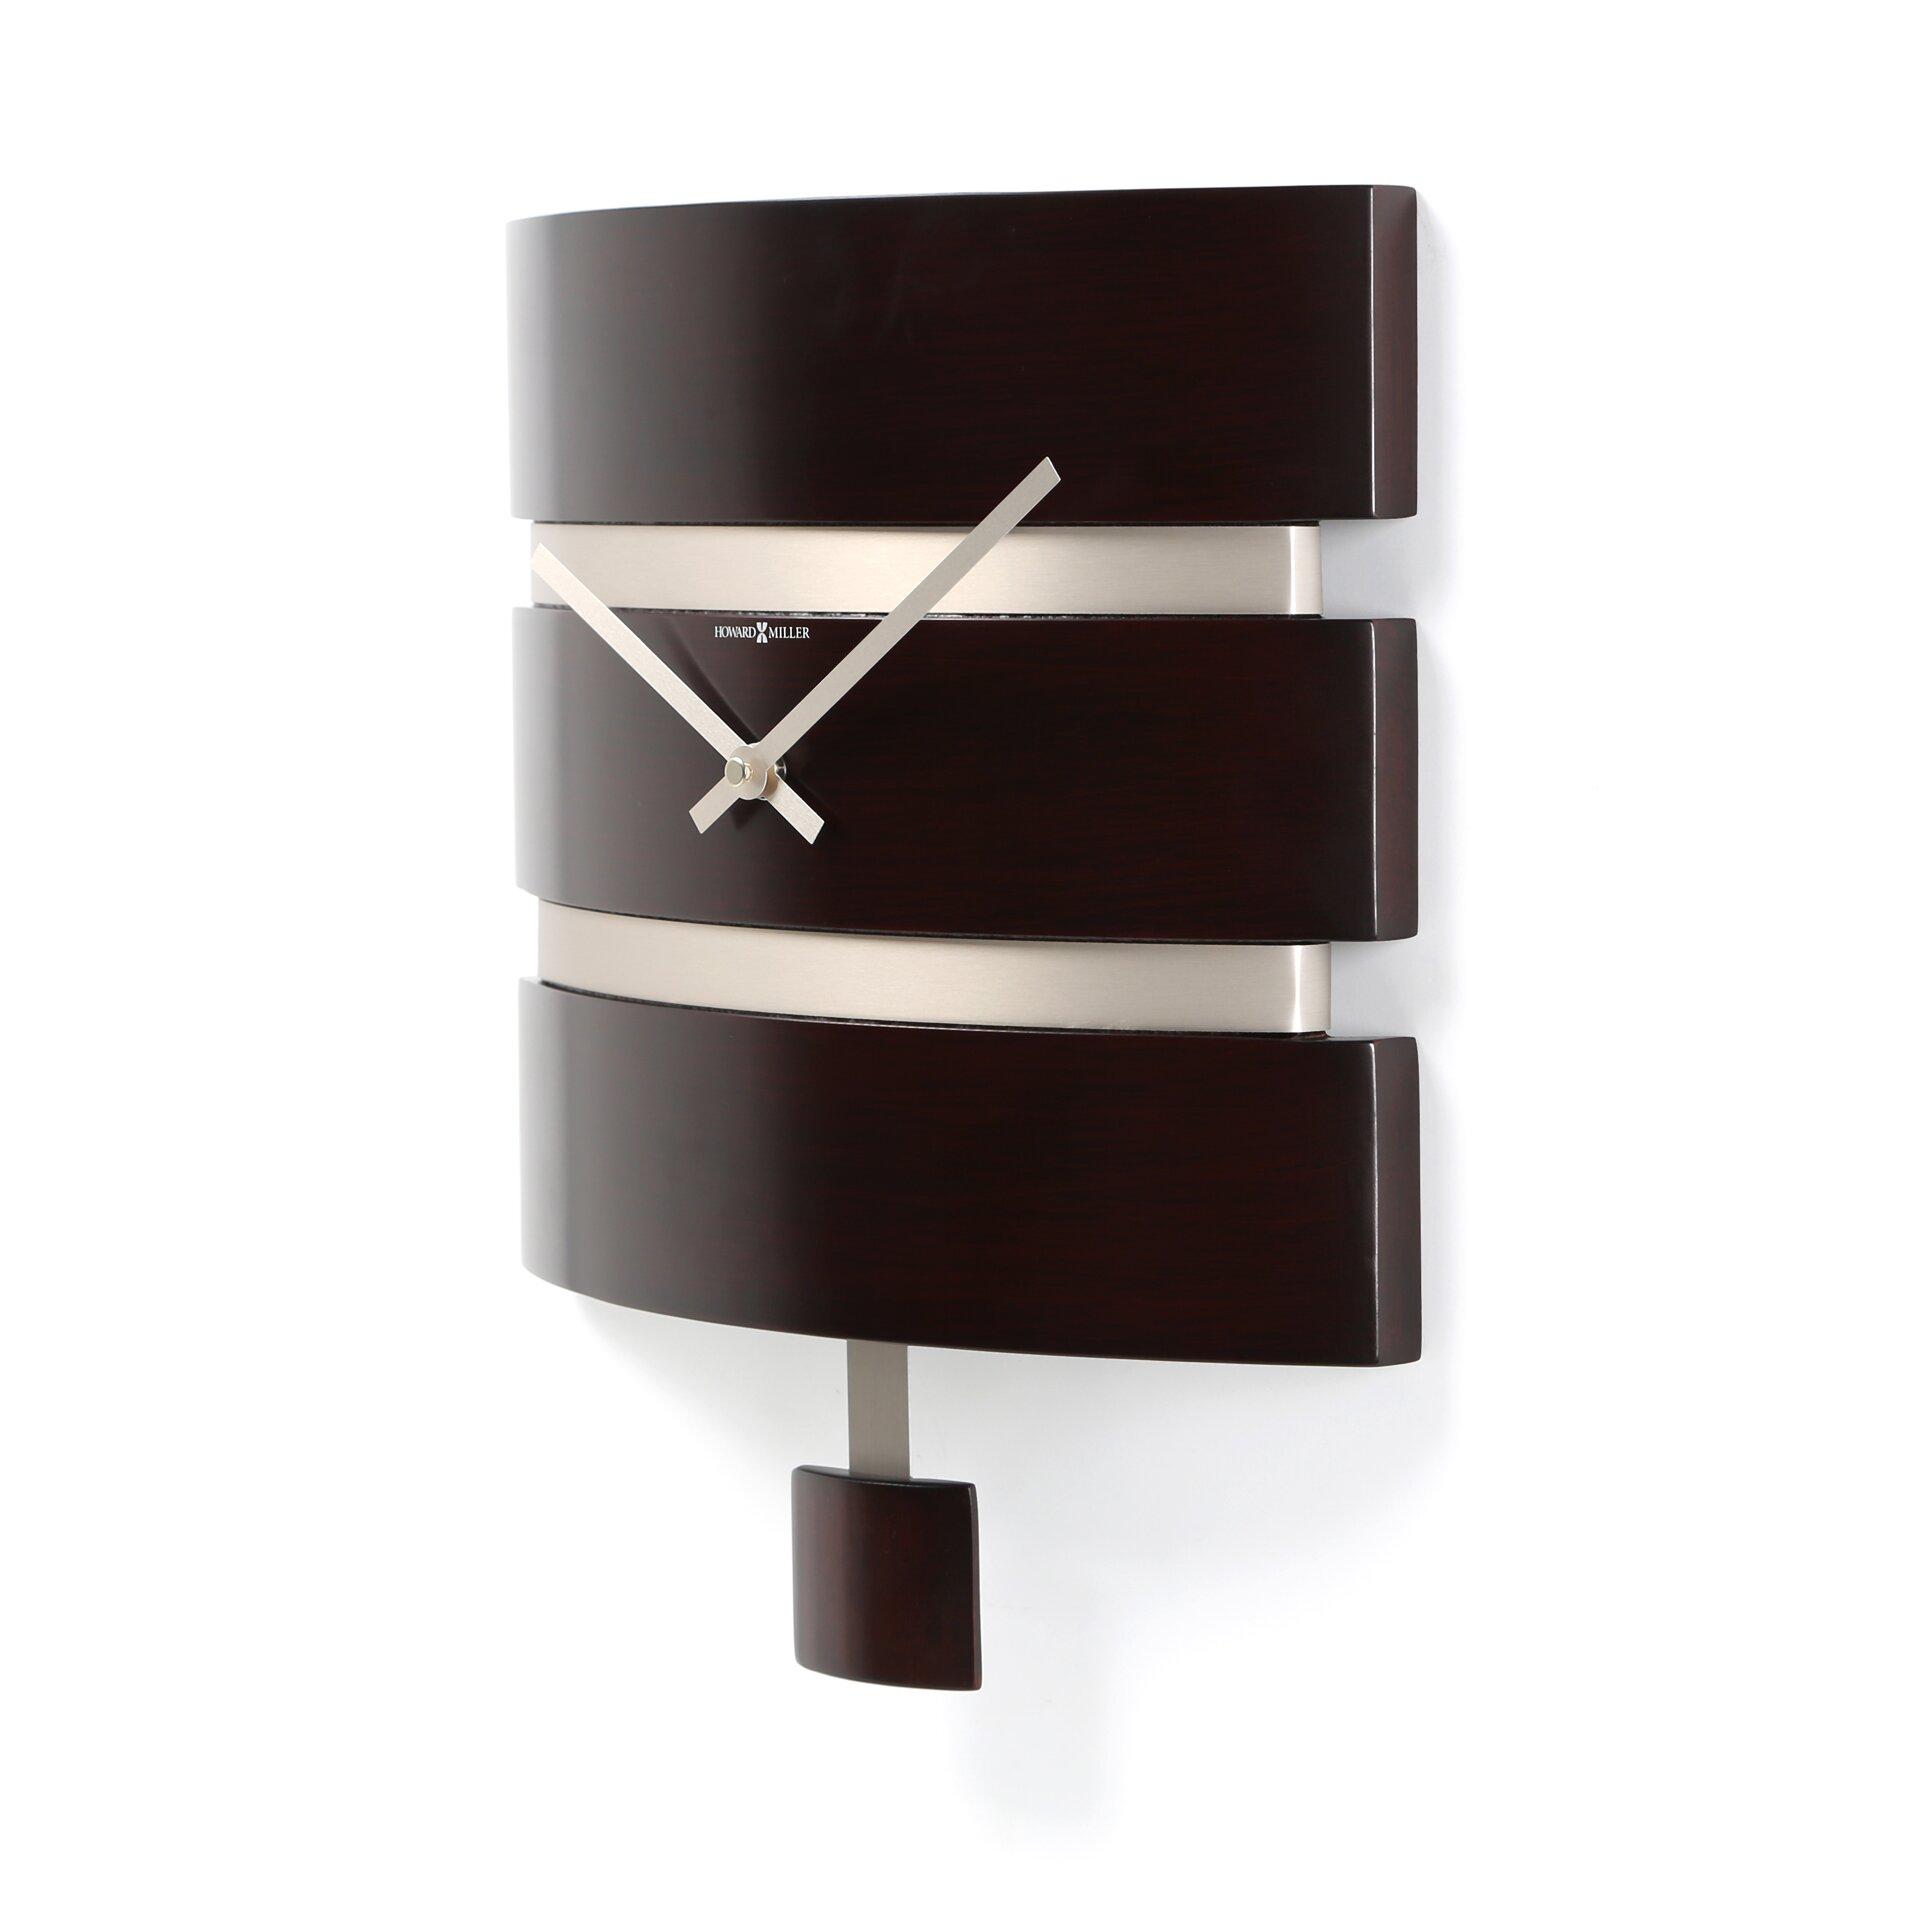 howard miller morrison wall clock u0026 reviews wayfair - Howard Miller Wall Clock